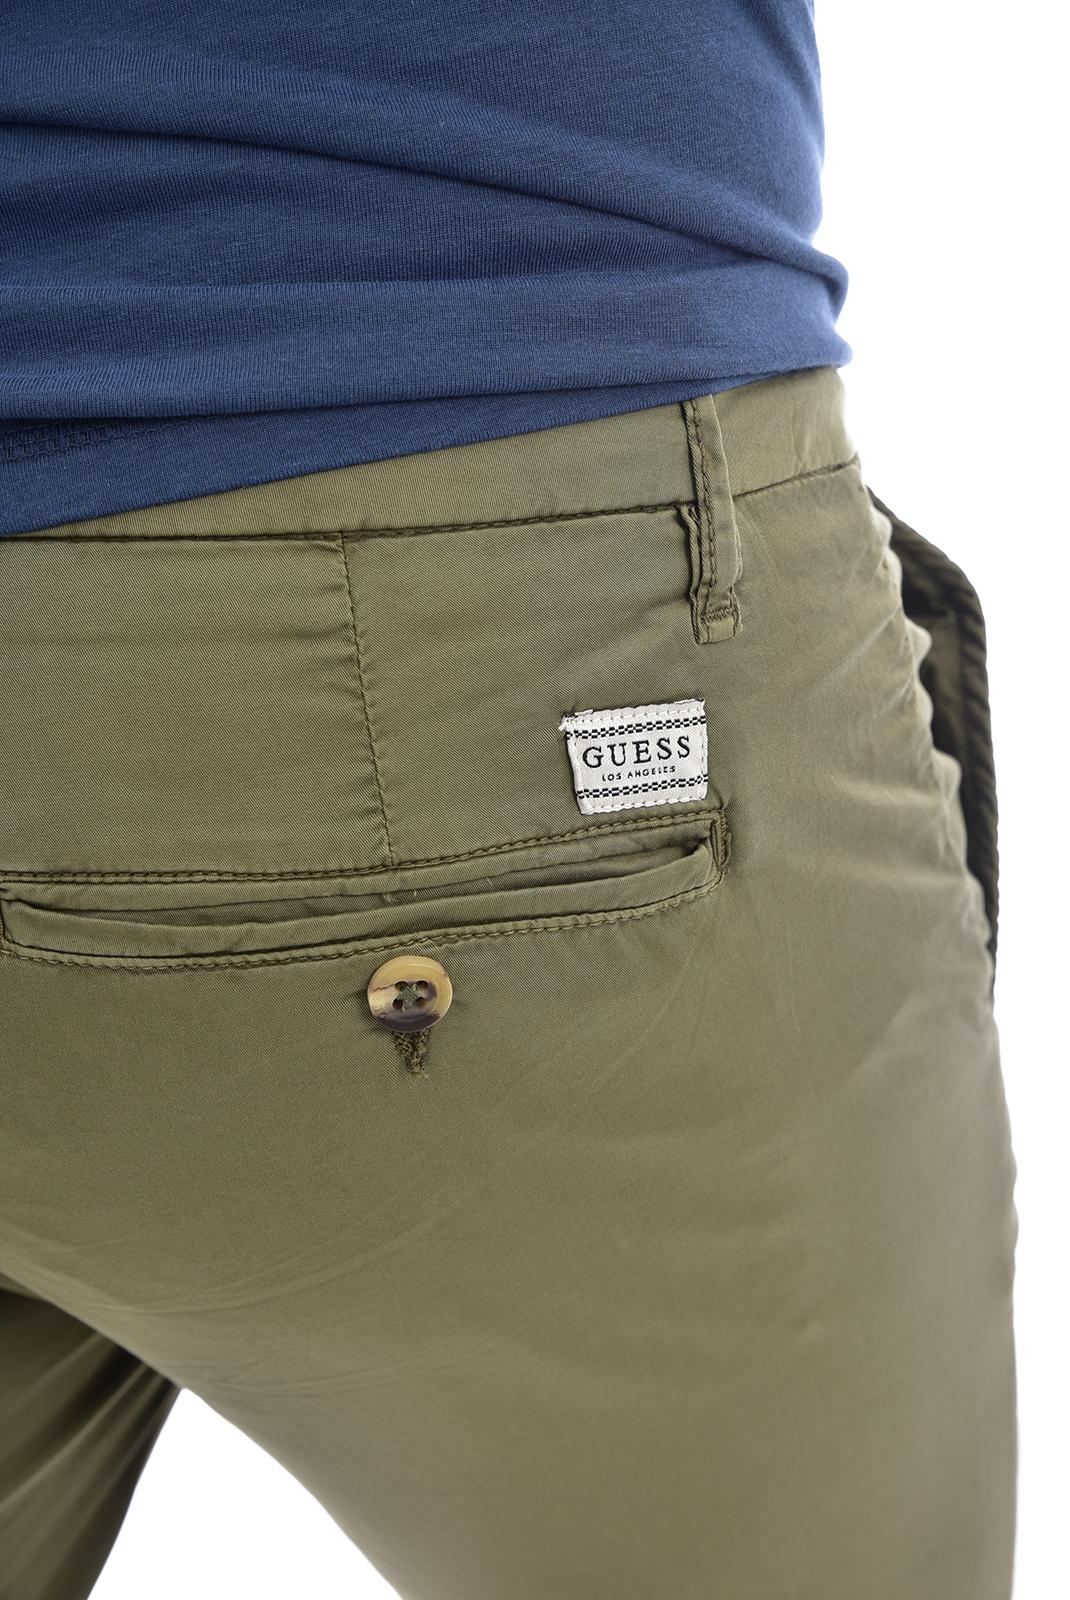 Homme  Guess jeans M02D05 WCRJ1 DANIEL G896 ARMY OLIVE